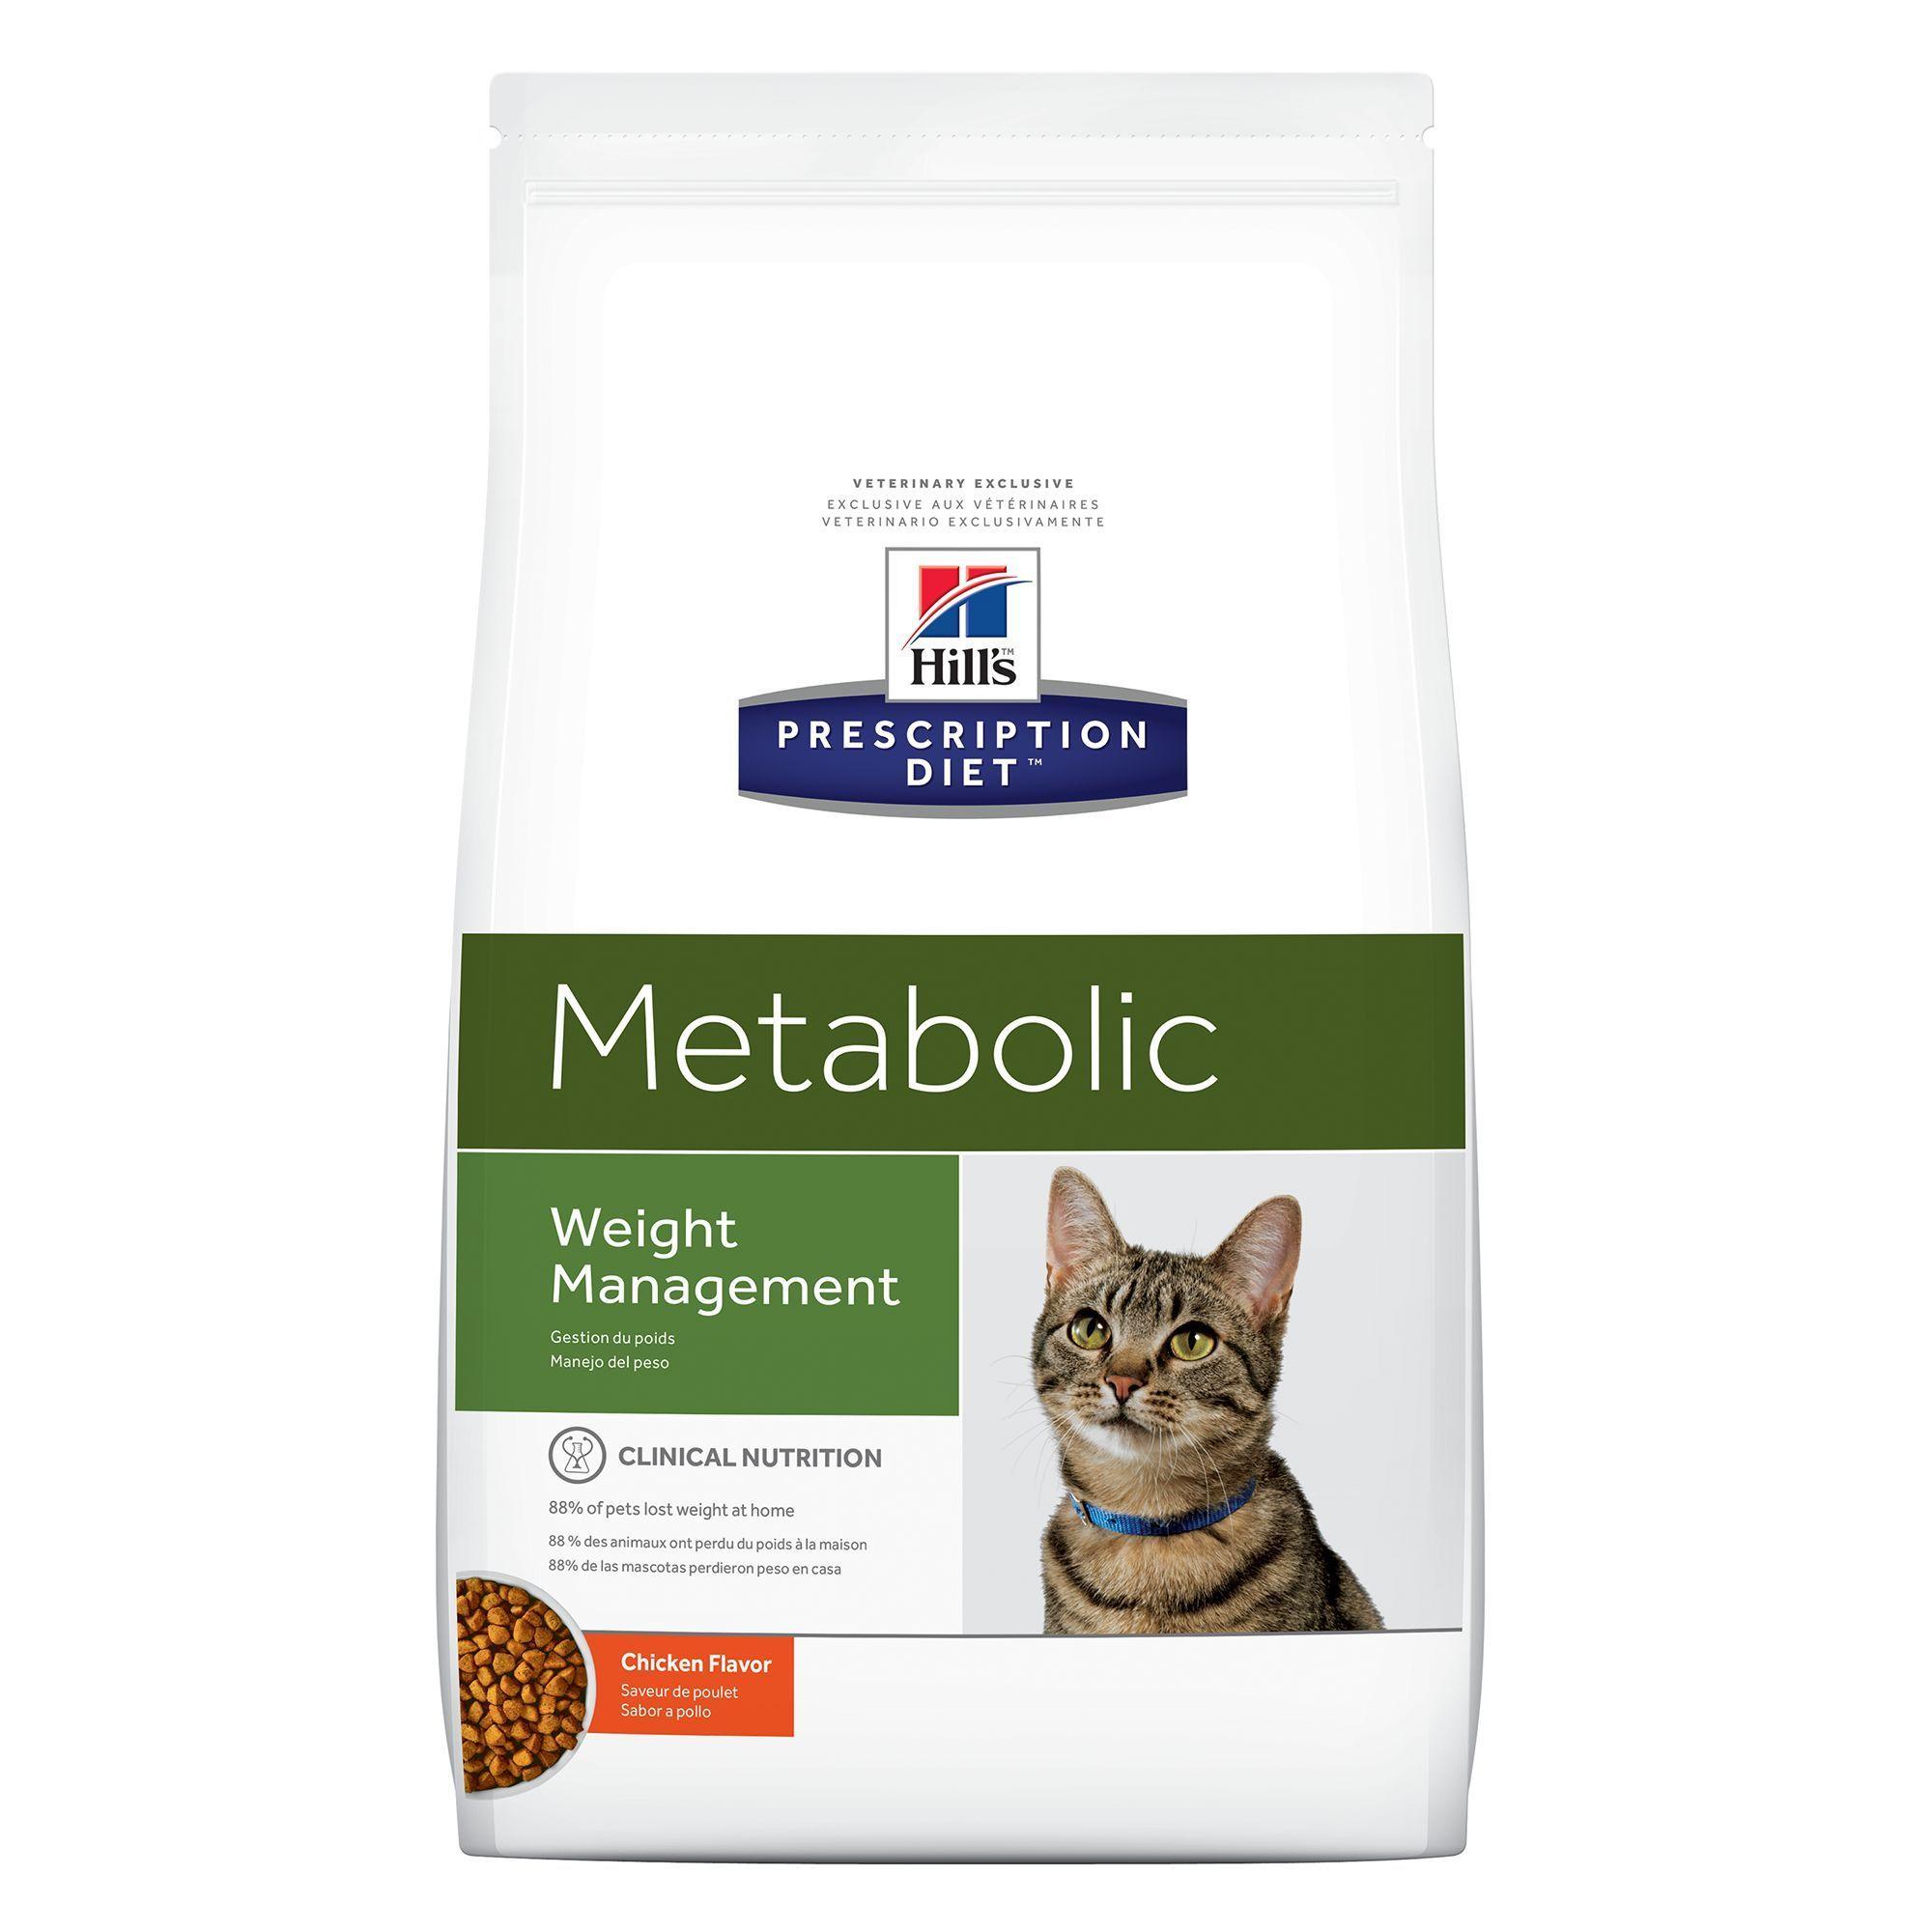 Hill S Prescription Diet Metabolic Weight Management Cat Food Chicken Size 8 5 Lb In 2020 Hills Prescription Diet Dry Cat Food Dry Dog Food